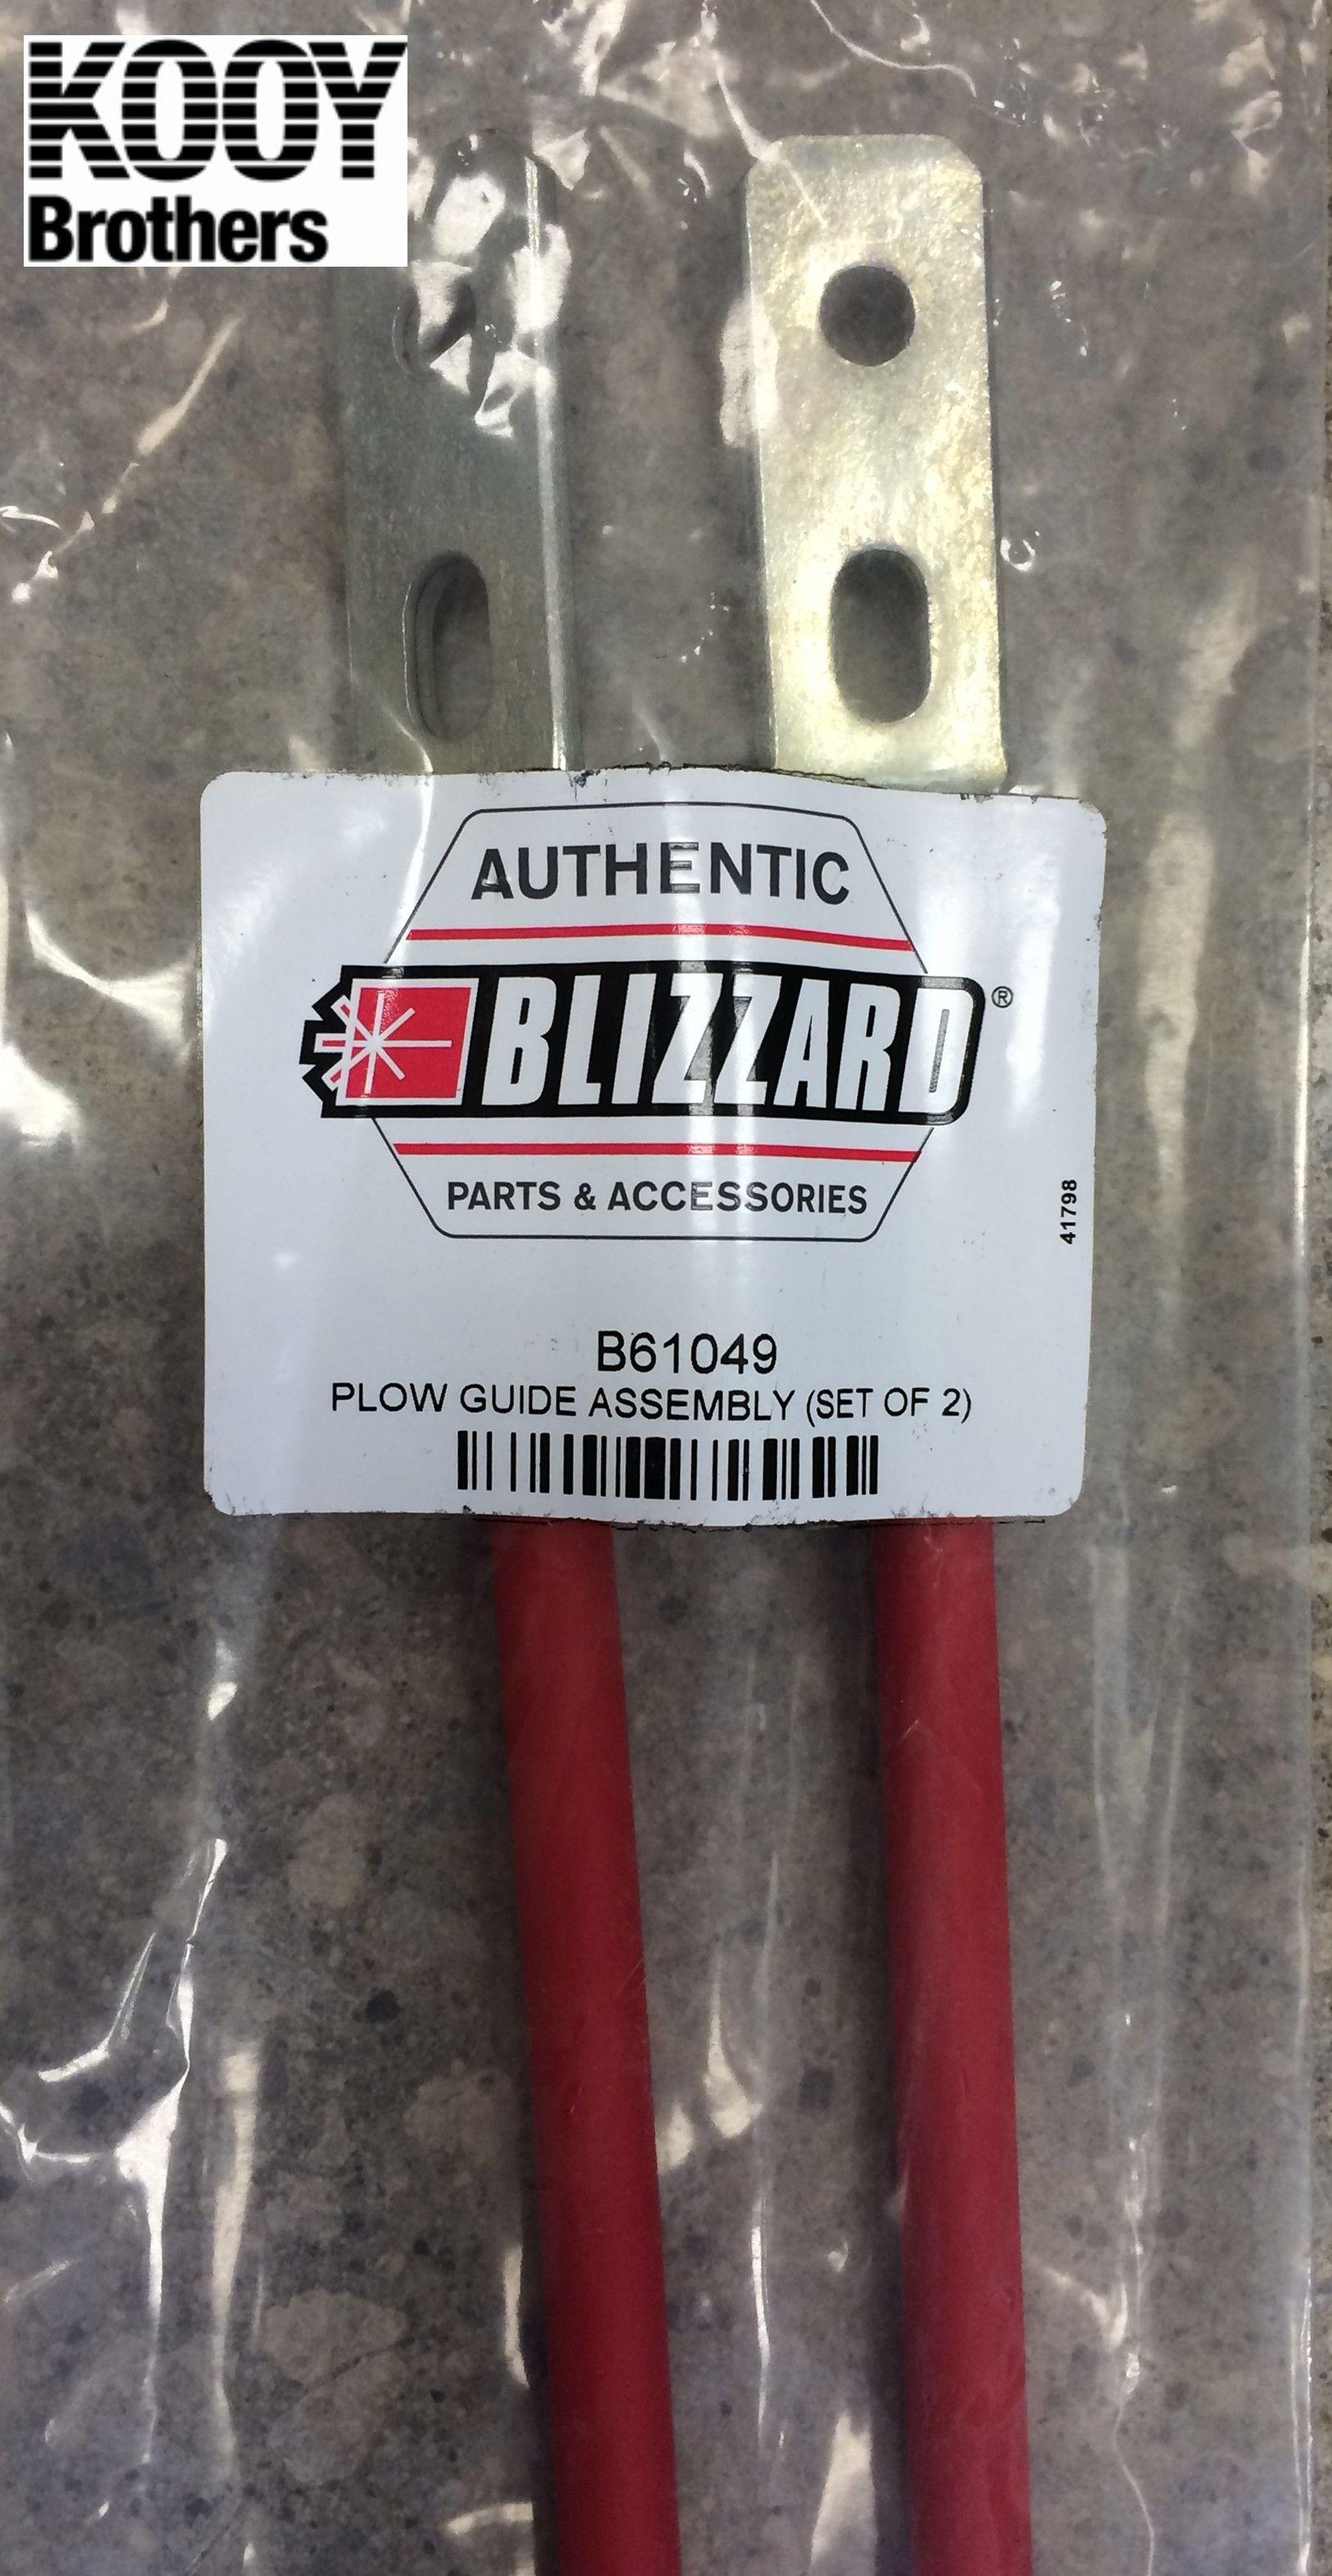 Blizzard Plow Guide Assembly model B61049